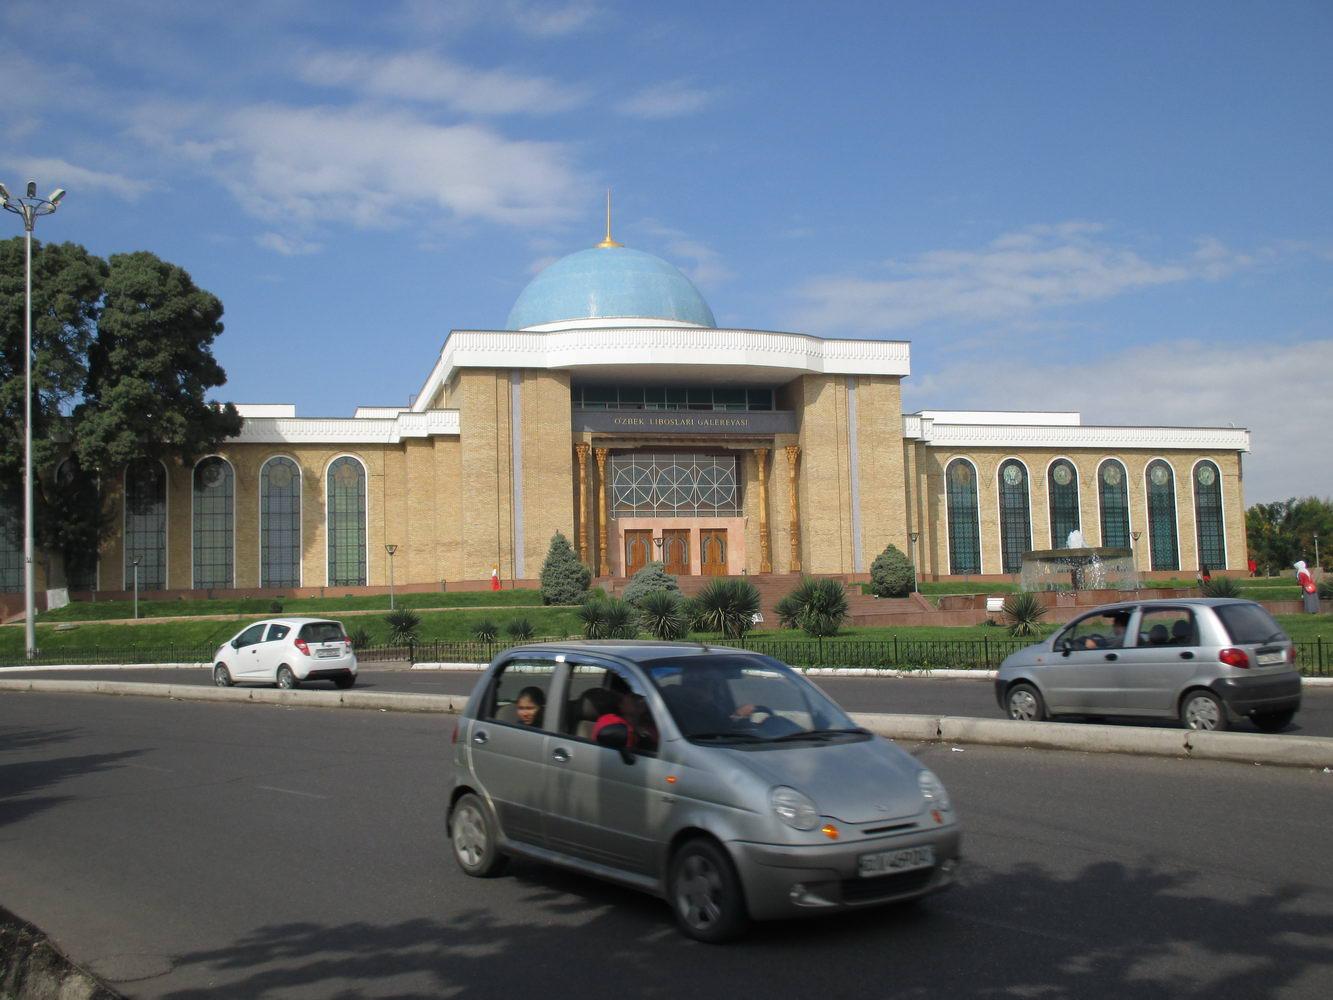 прогулка и достопримечательности города. узбекистан ташкент